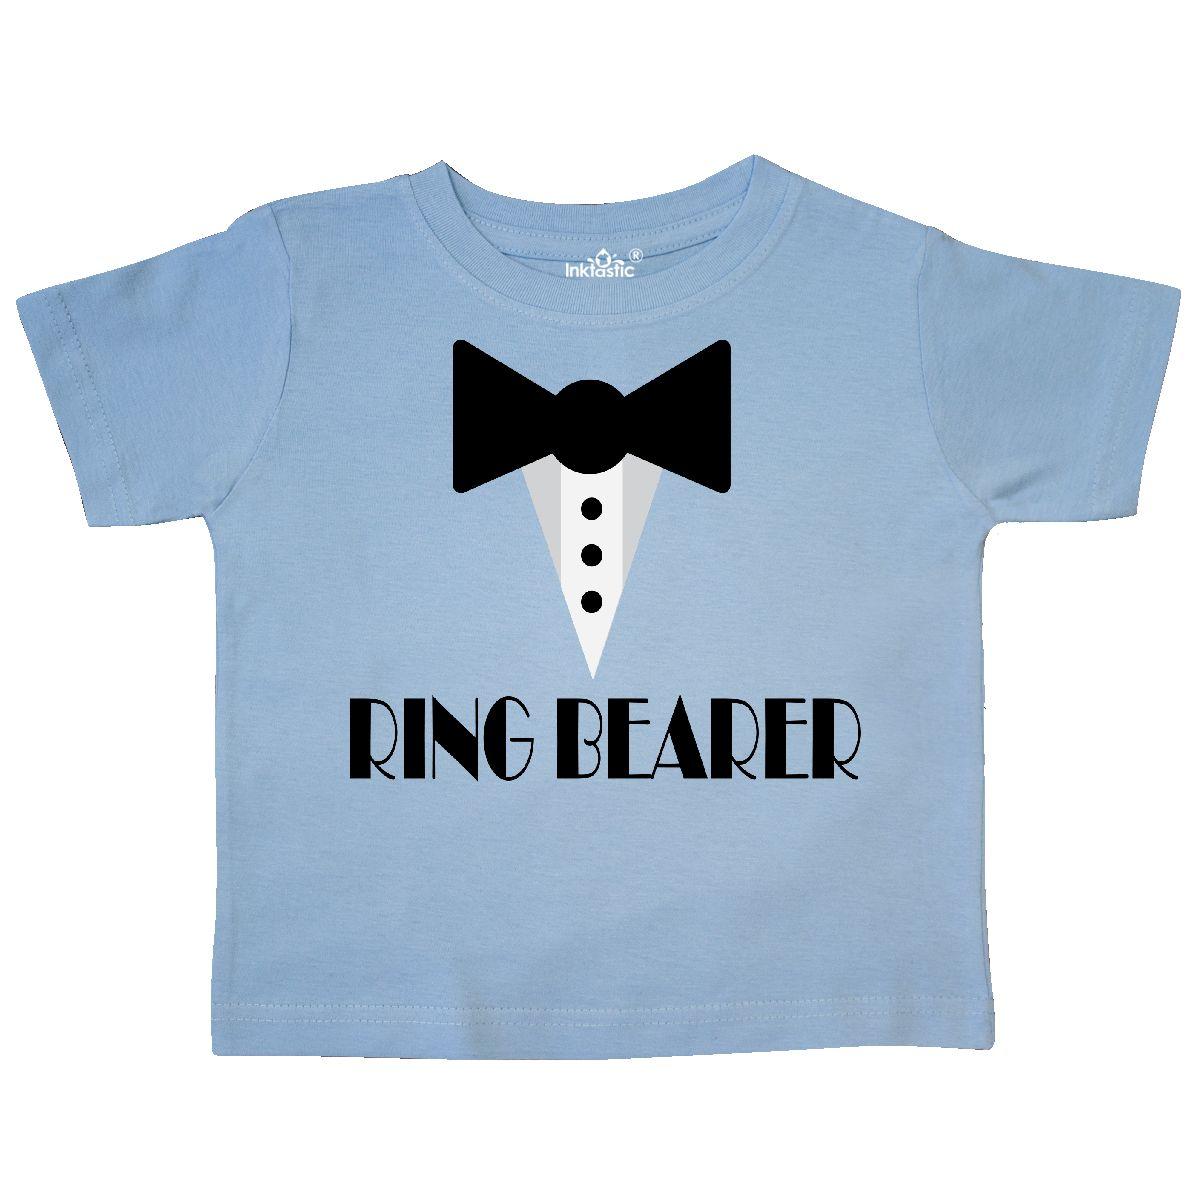 Inktastic Ringbearer Mock Tux Wedding Tuxedo Toddler T-Shirt Ring ...